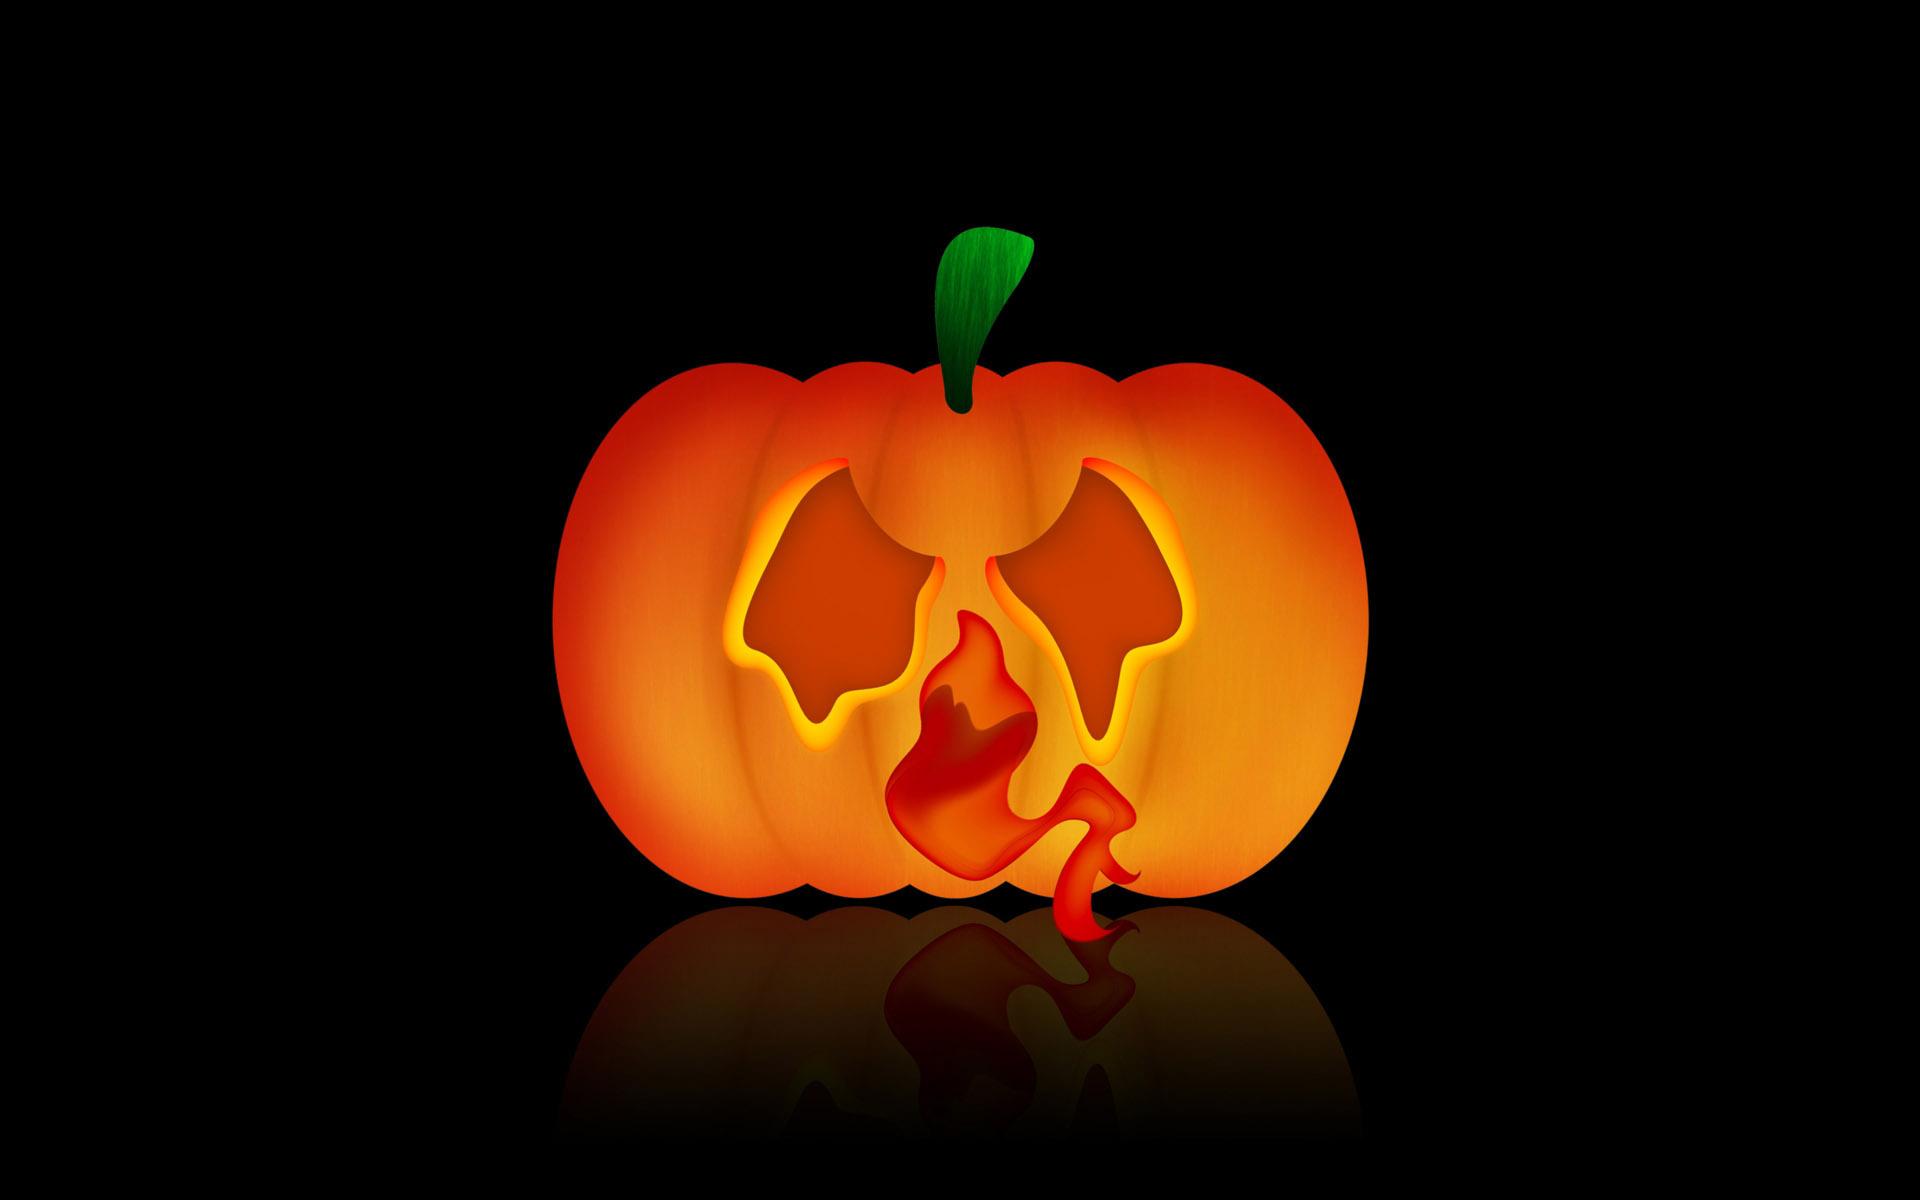 Halloween Widescreen Crazy Pumpkins Wallpapers X Hr Wallpapers